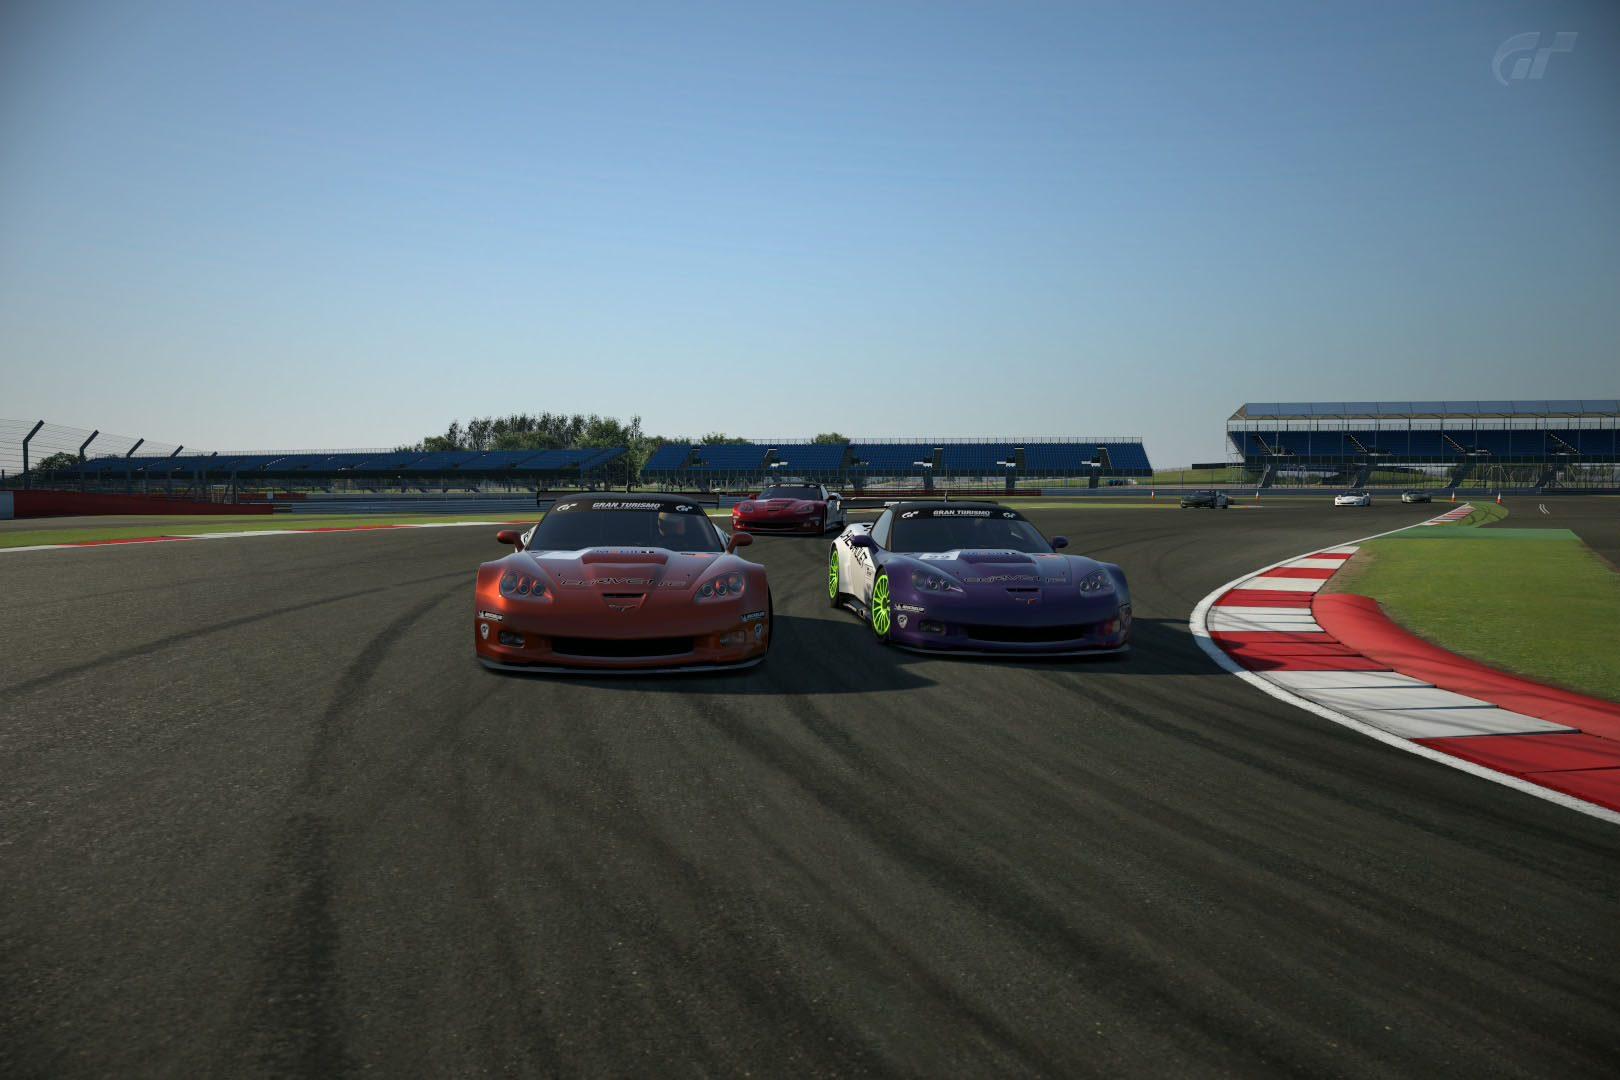 Silverstone Grand Prix Circuit no 22.jpg